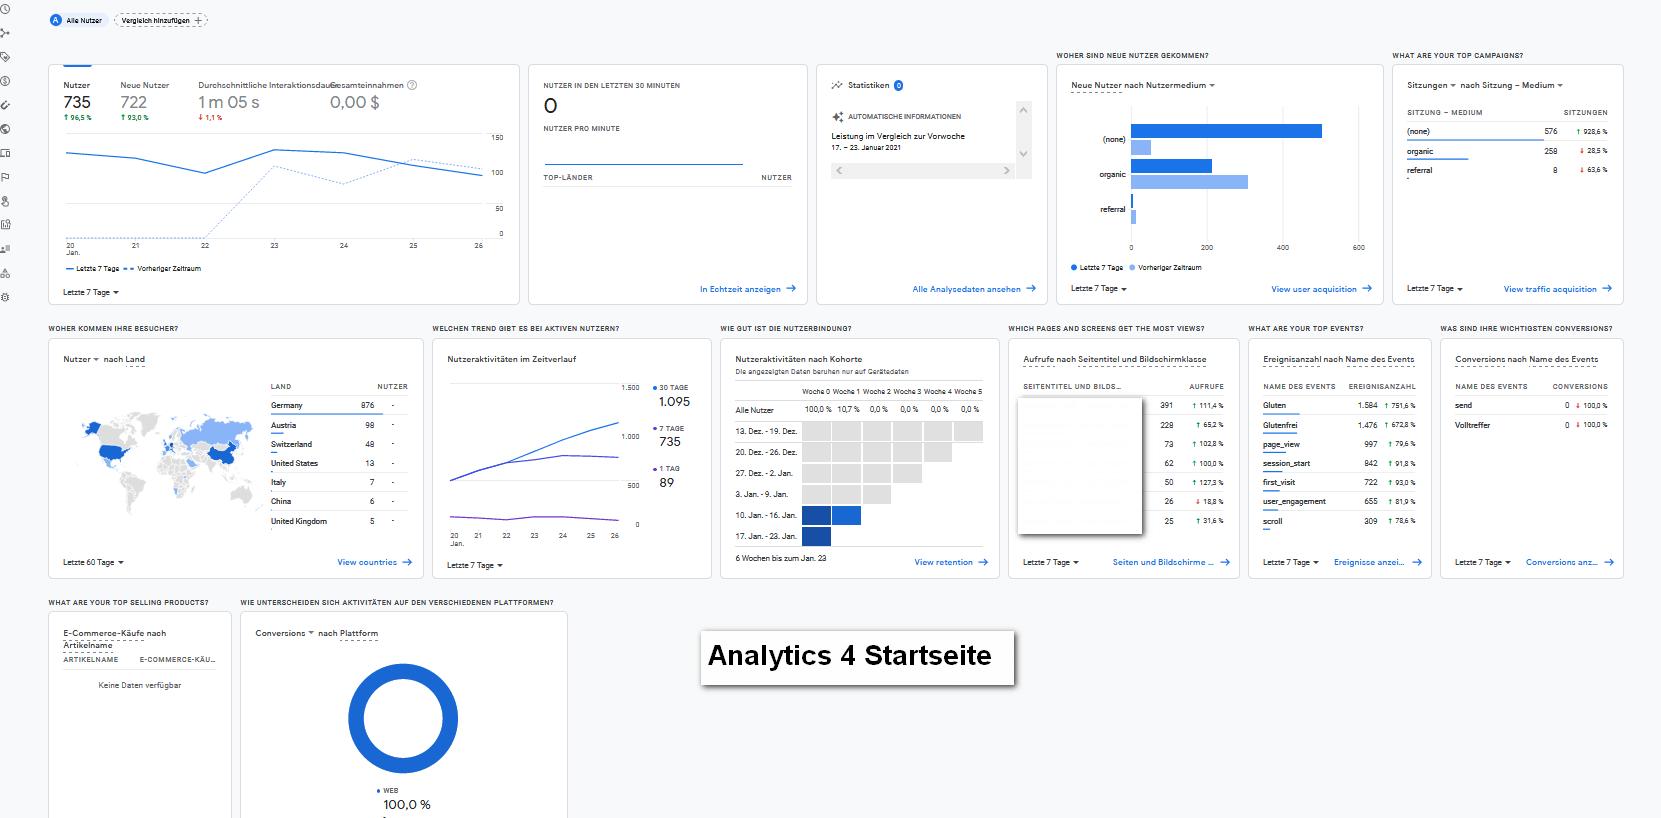 Analytics 4 Startseite